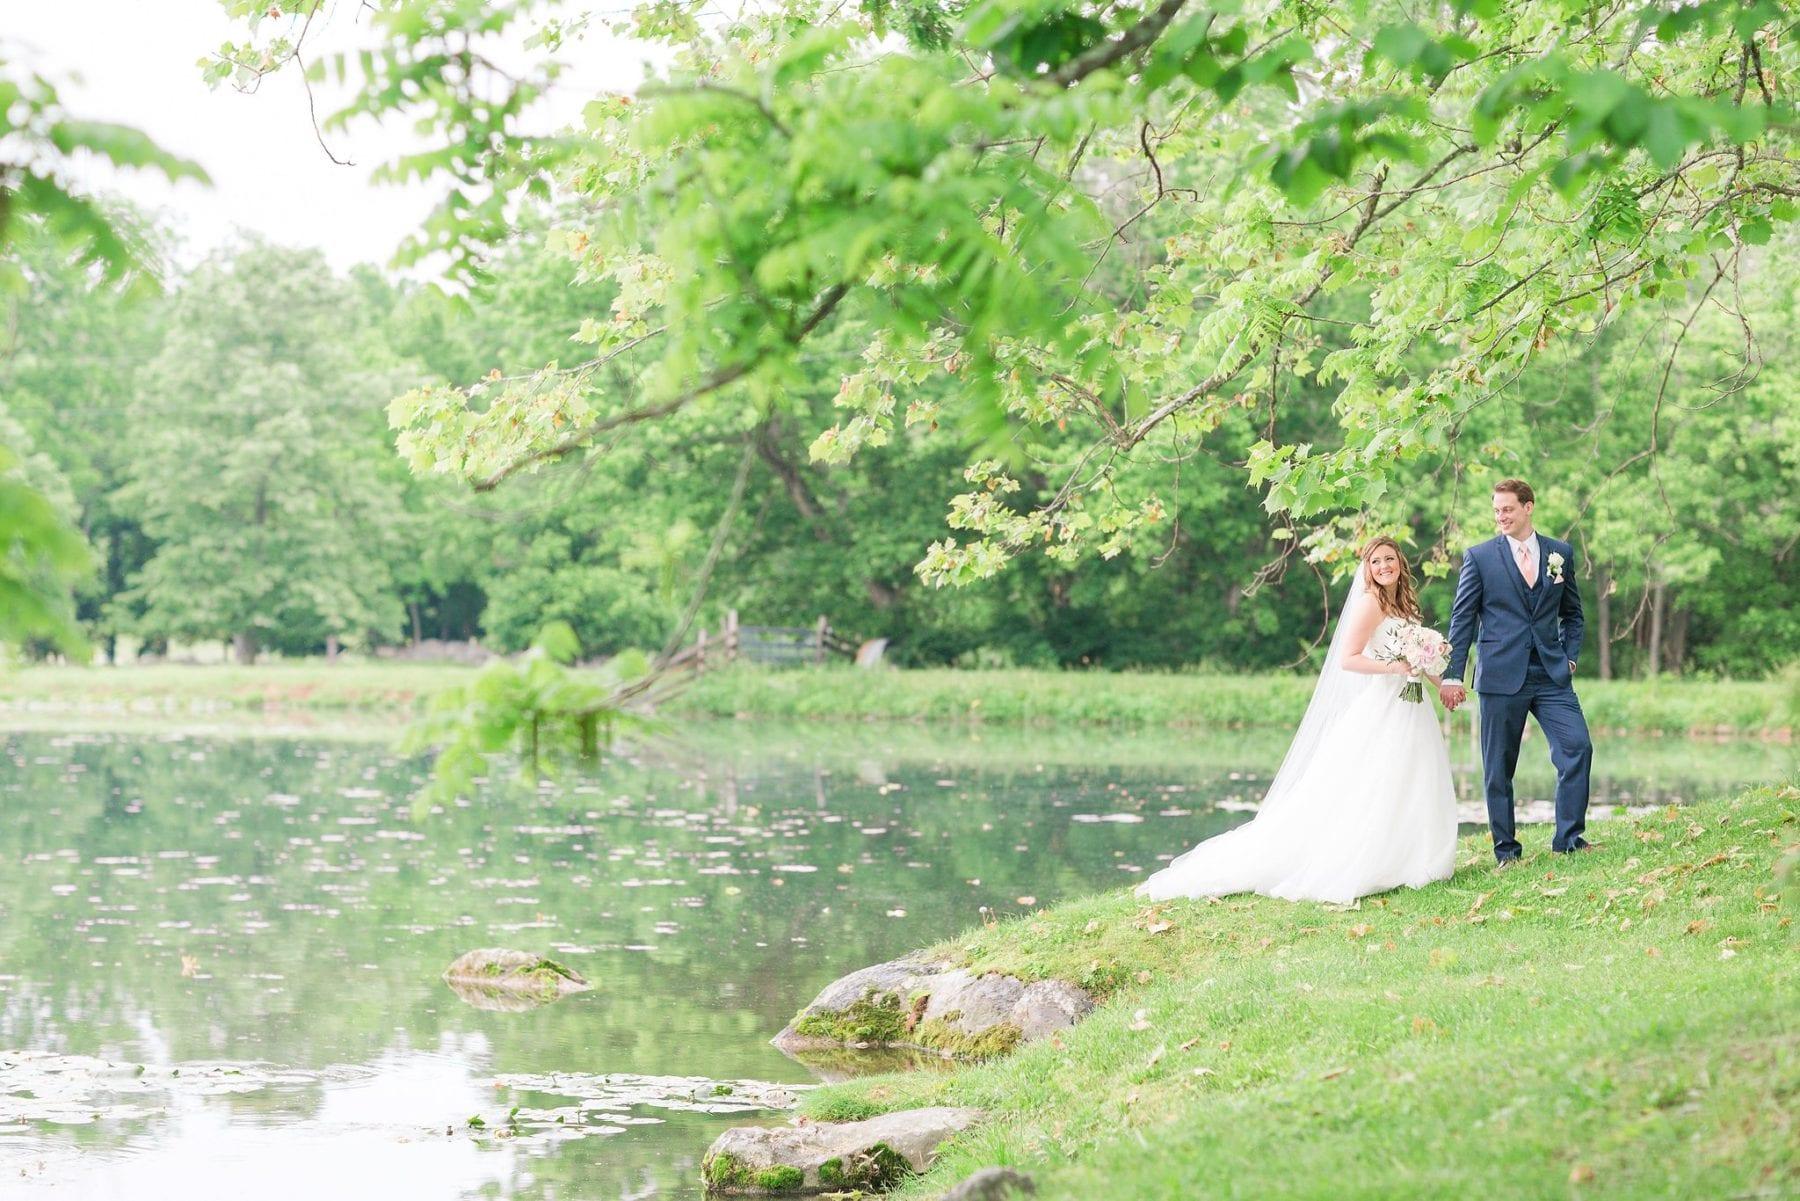 Justin & Megan Big Spring Farm Wedding Photos-198.jpg